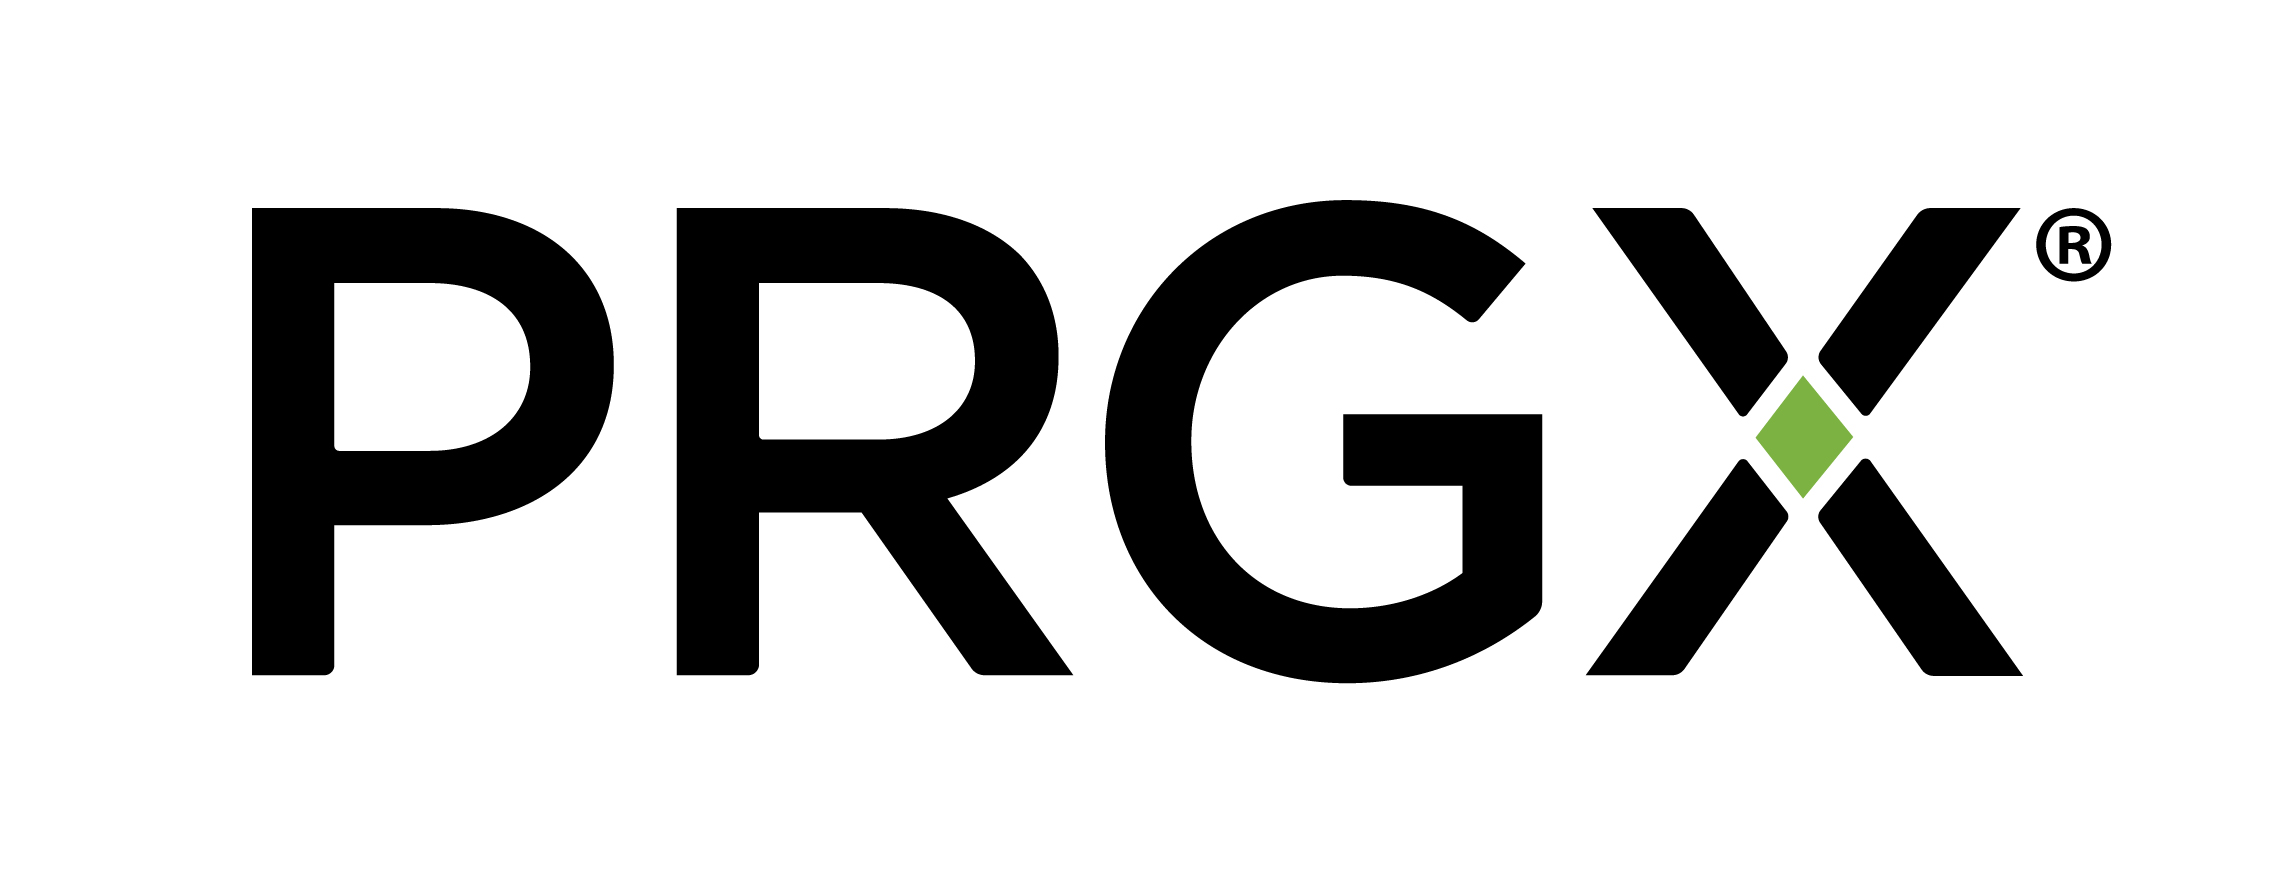 PRGX Global Inc.